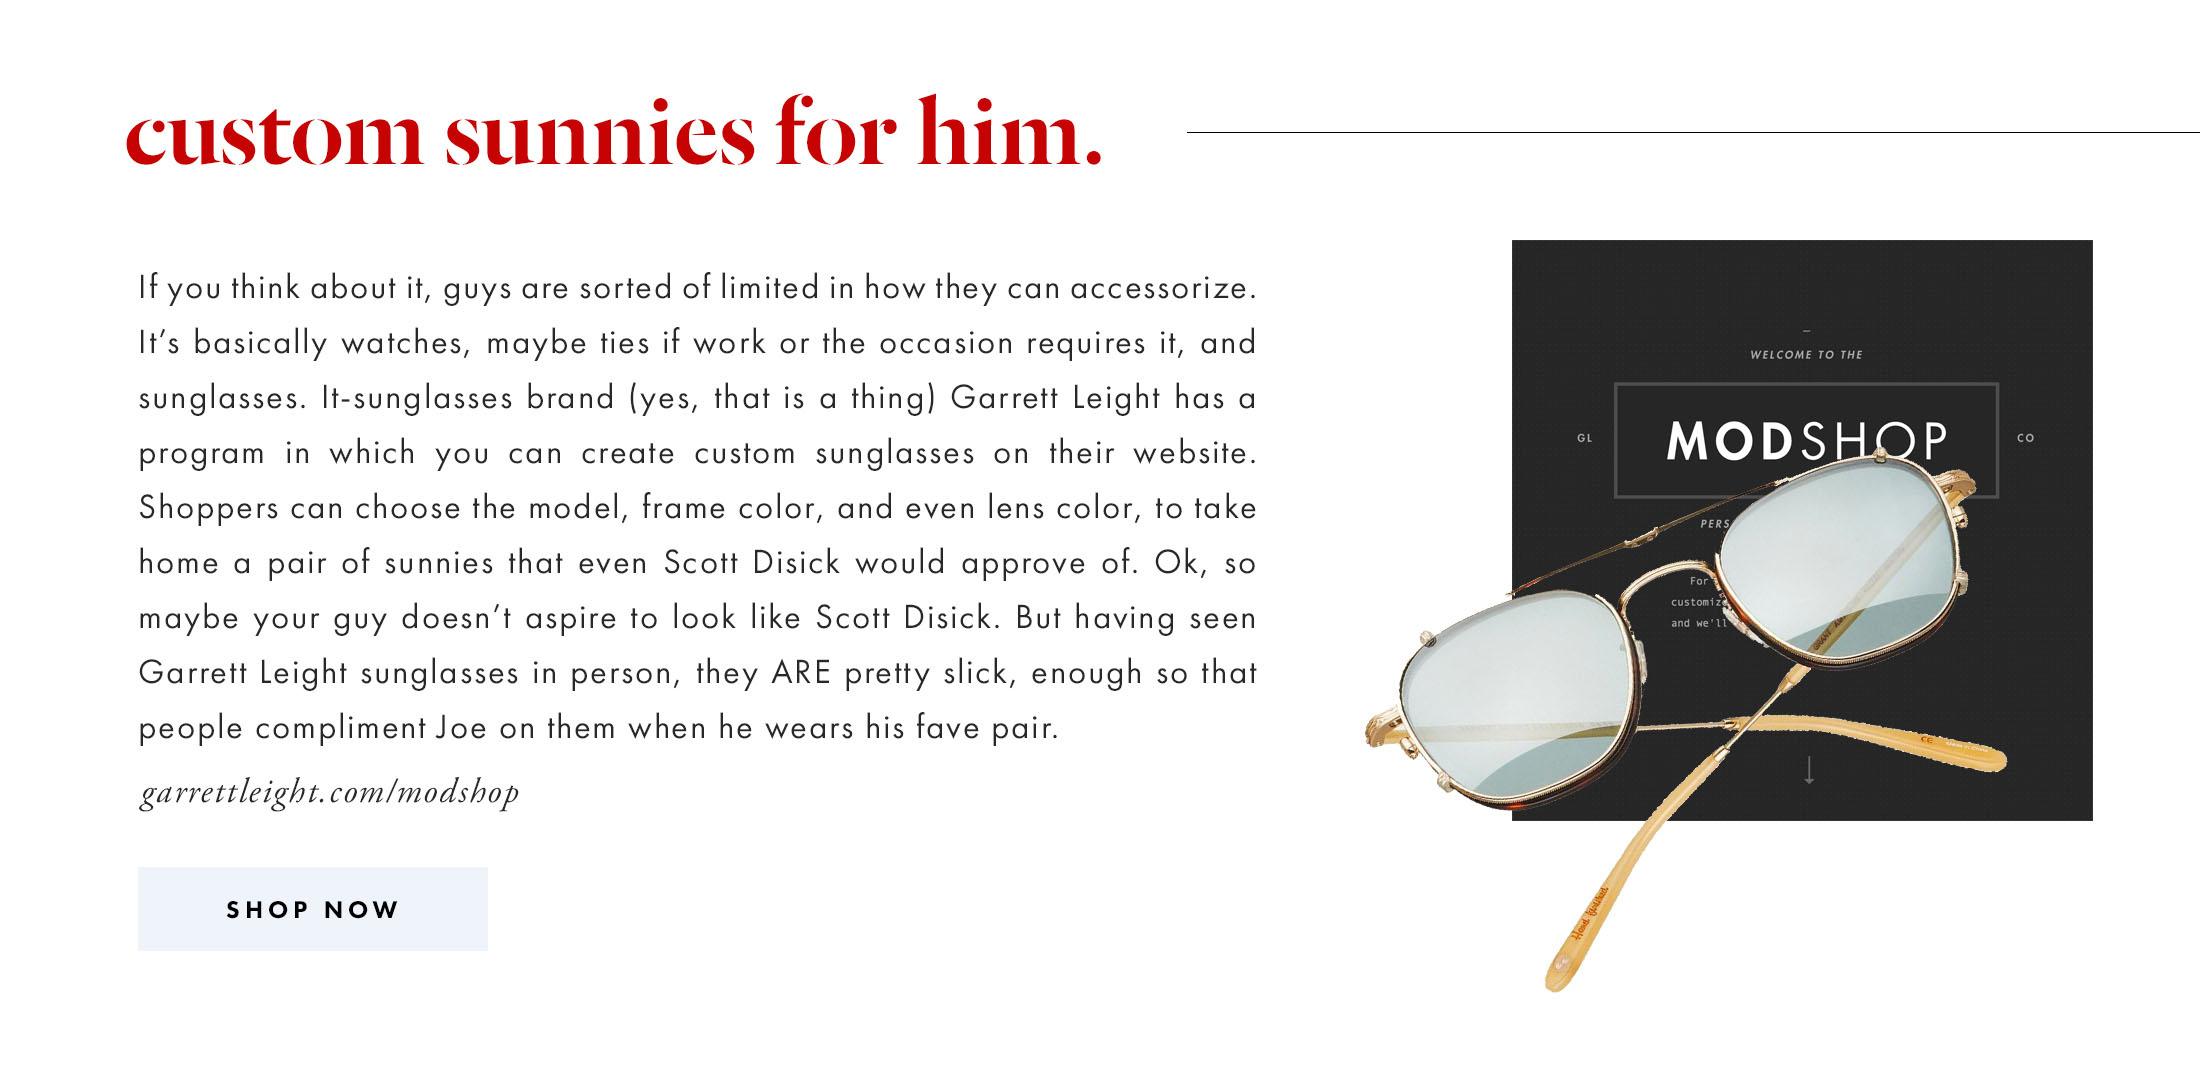 gift-idea-custom-sunglasses-from-garrett-leight